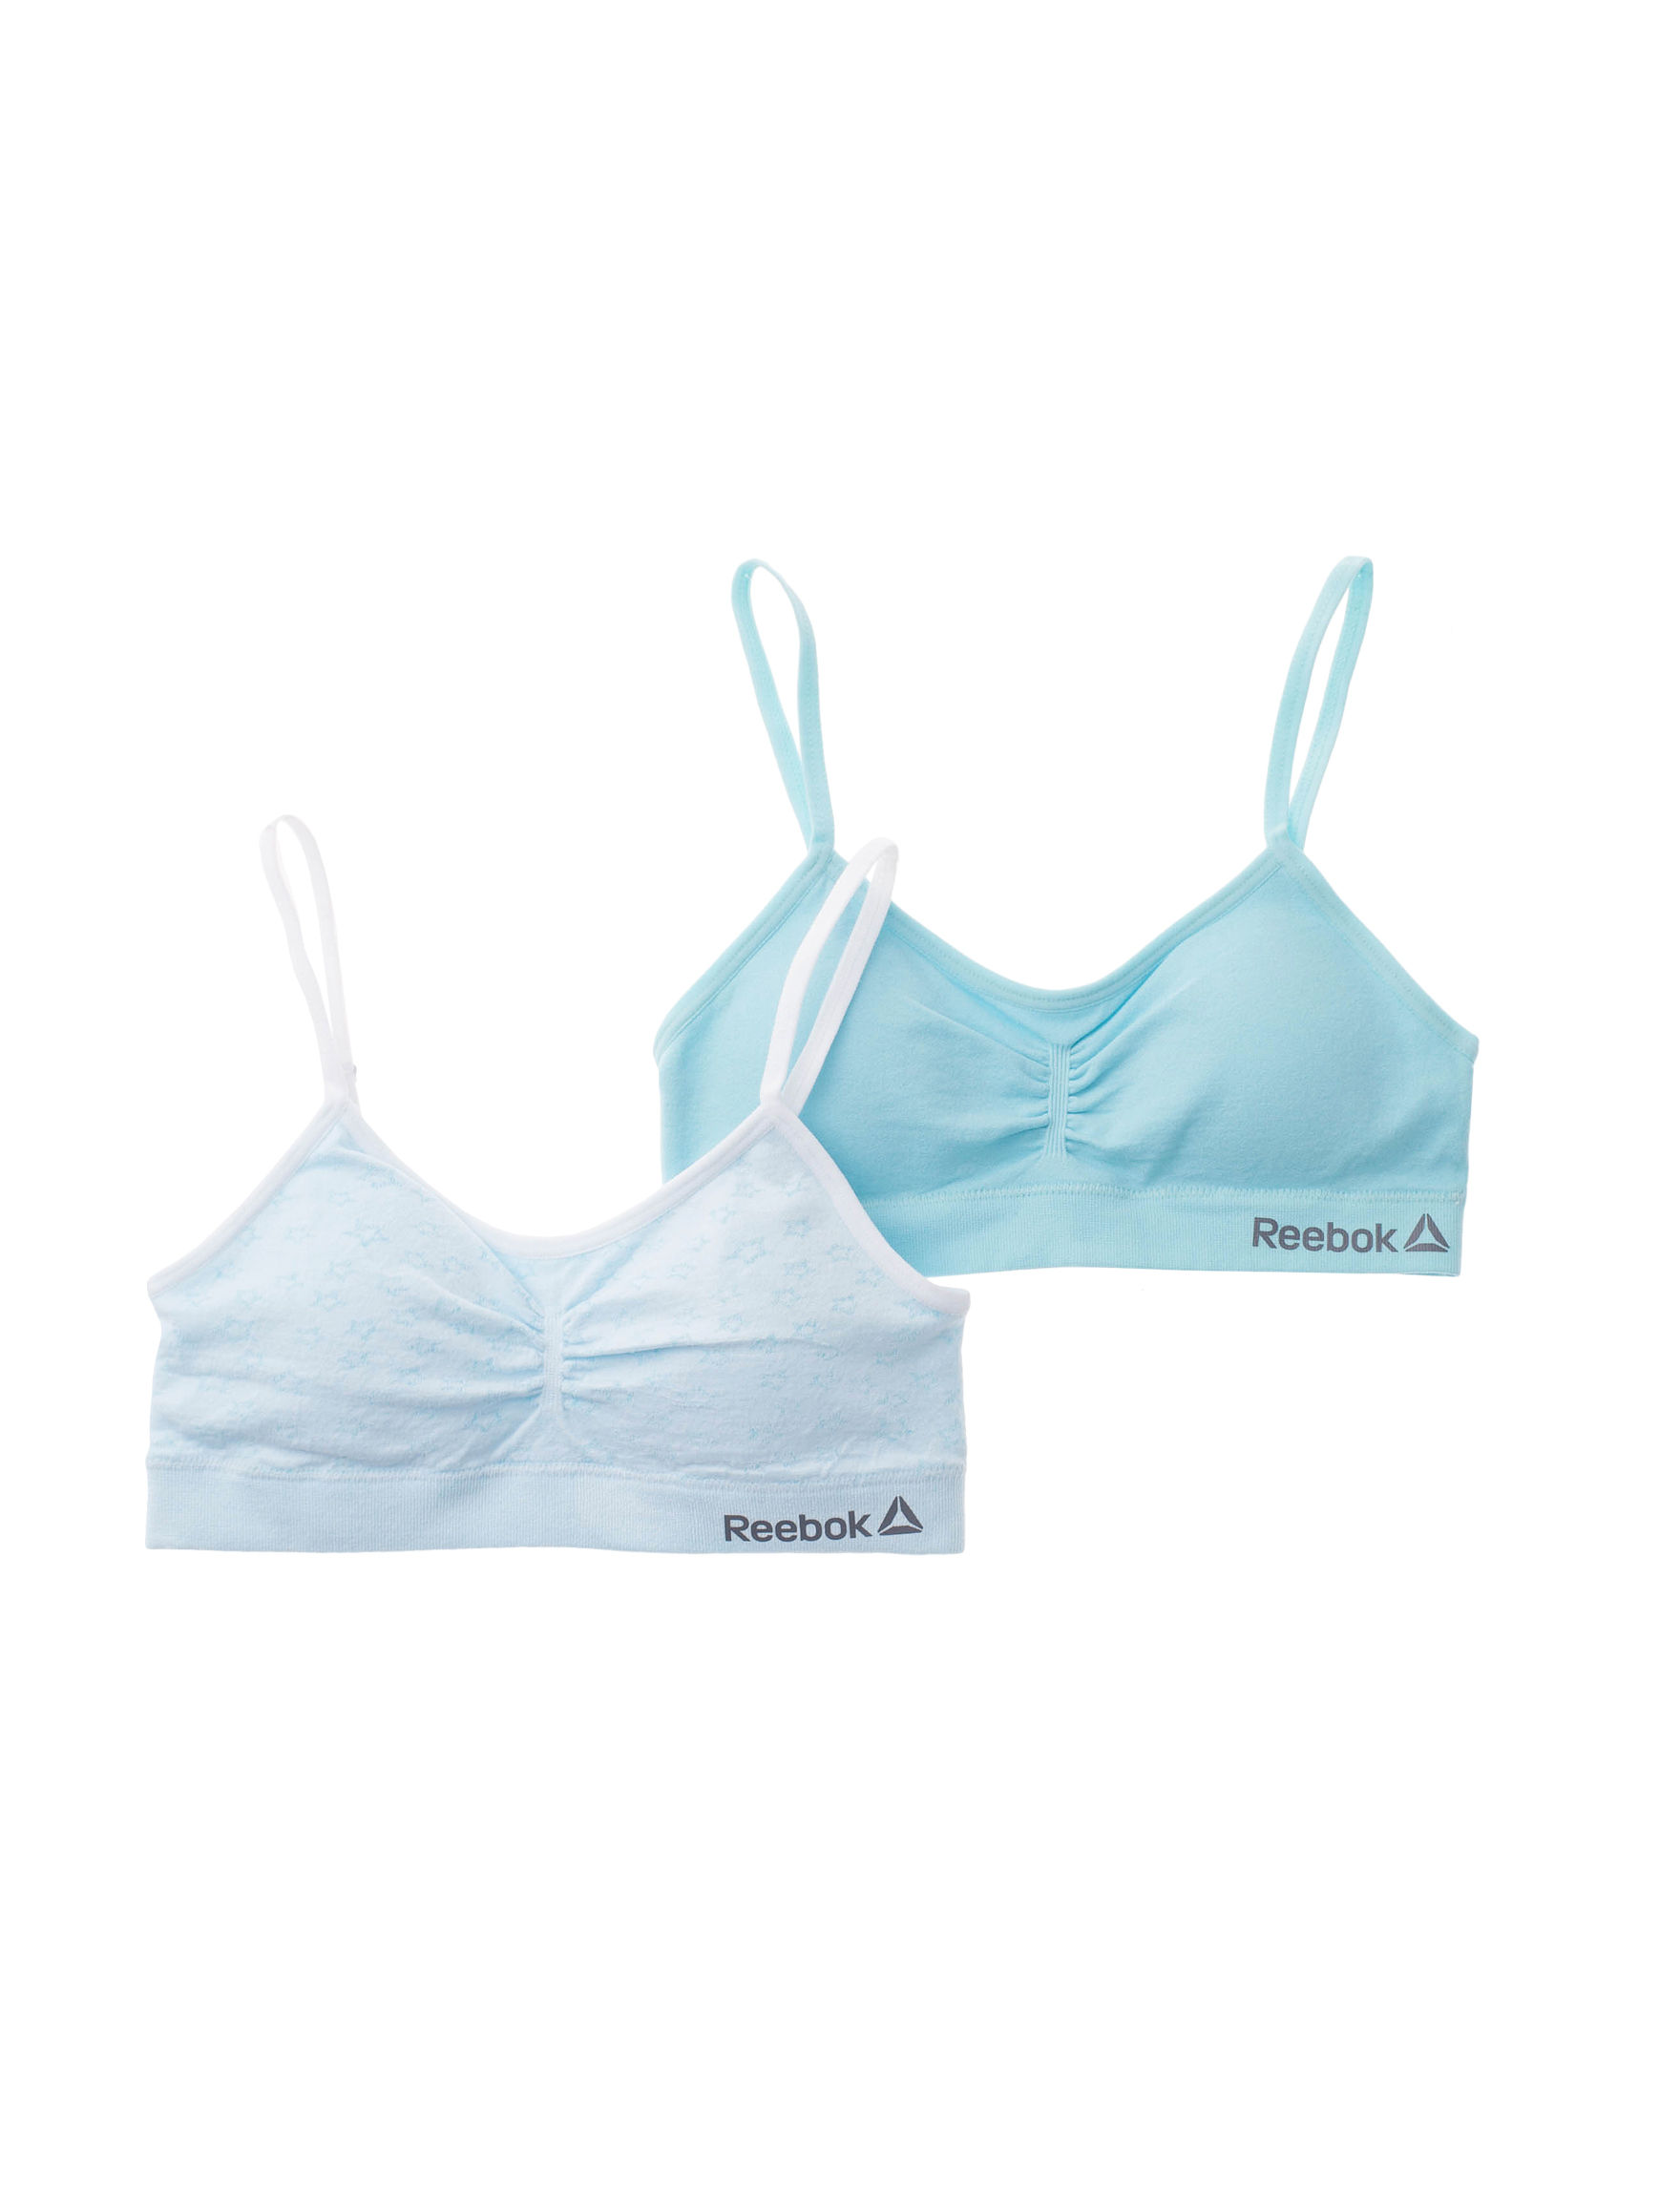 Reebok Aqua / White